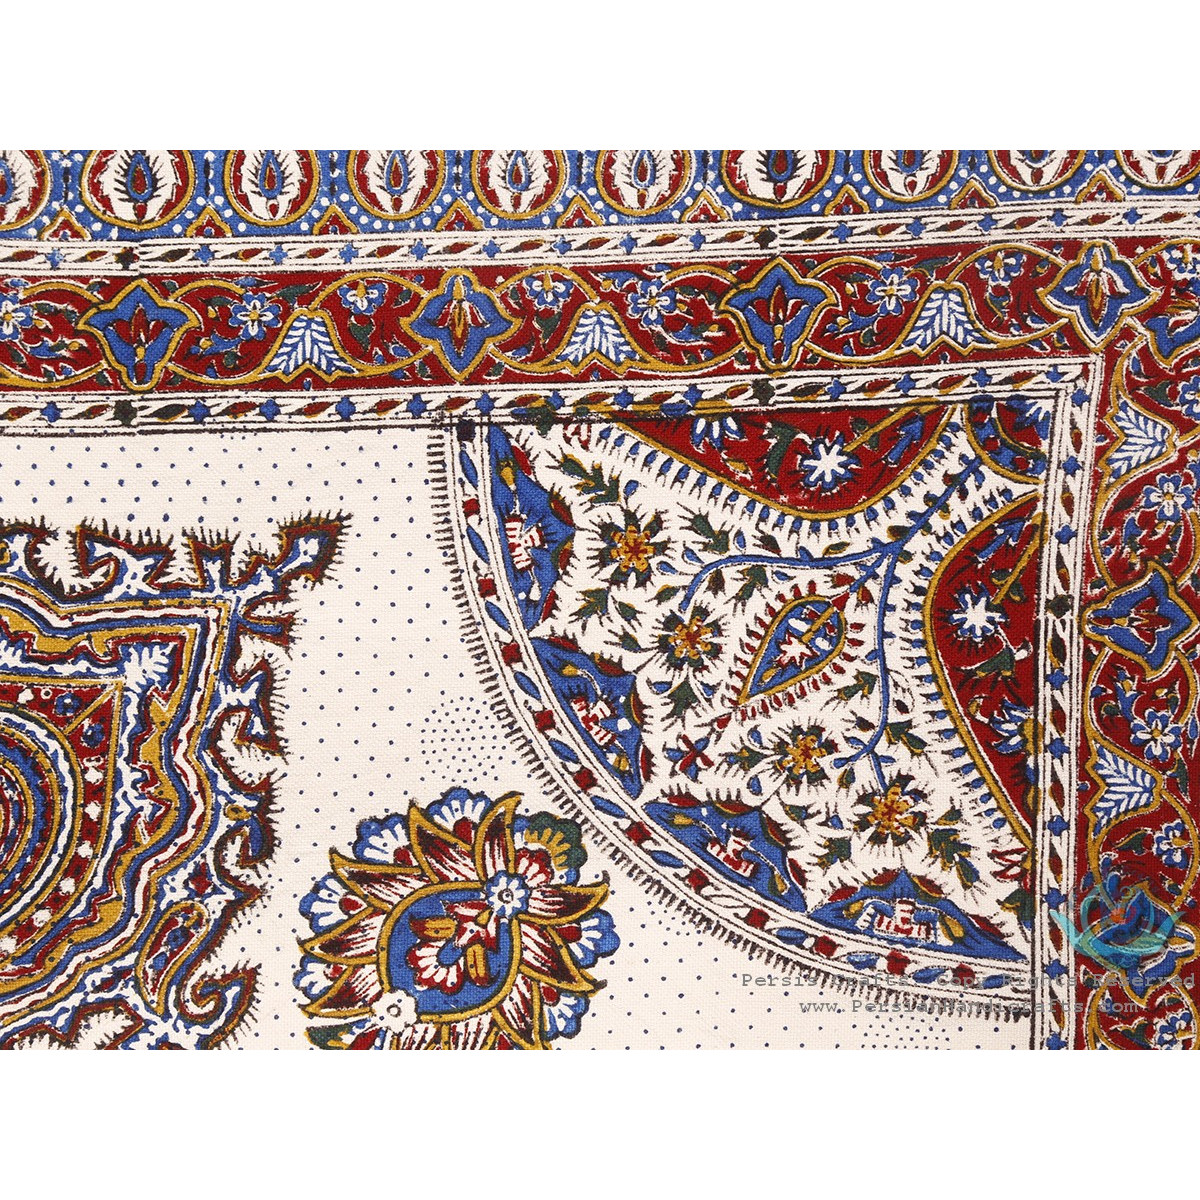 Multi Paisley Tapestry Ghalamkar Tablecloth - HGH3906-Persian Handicrafts